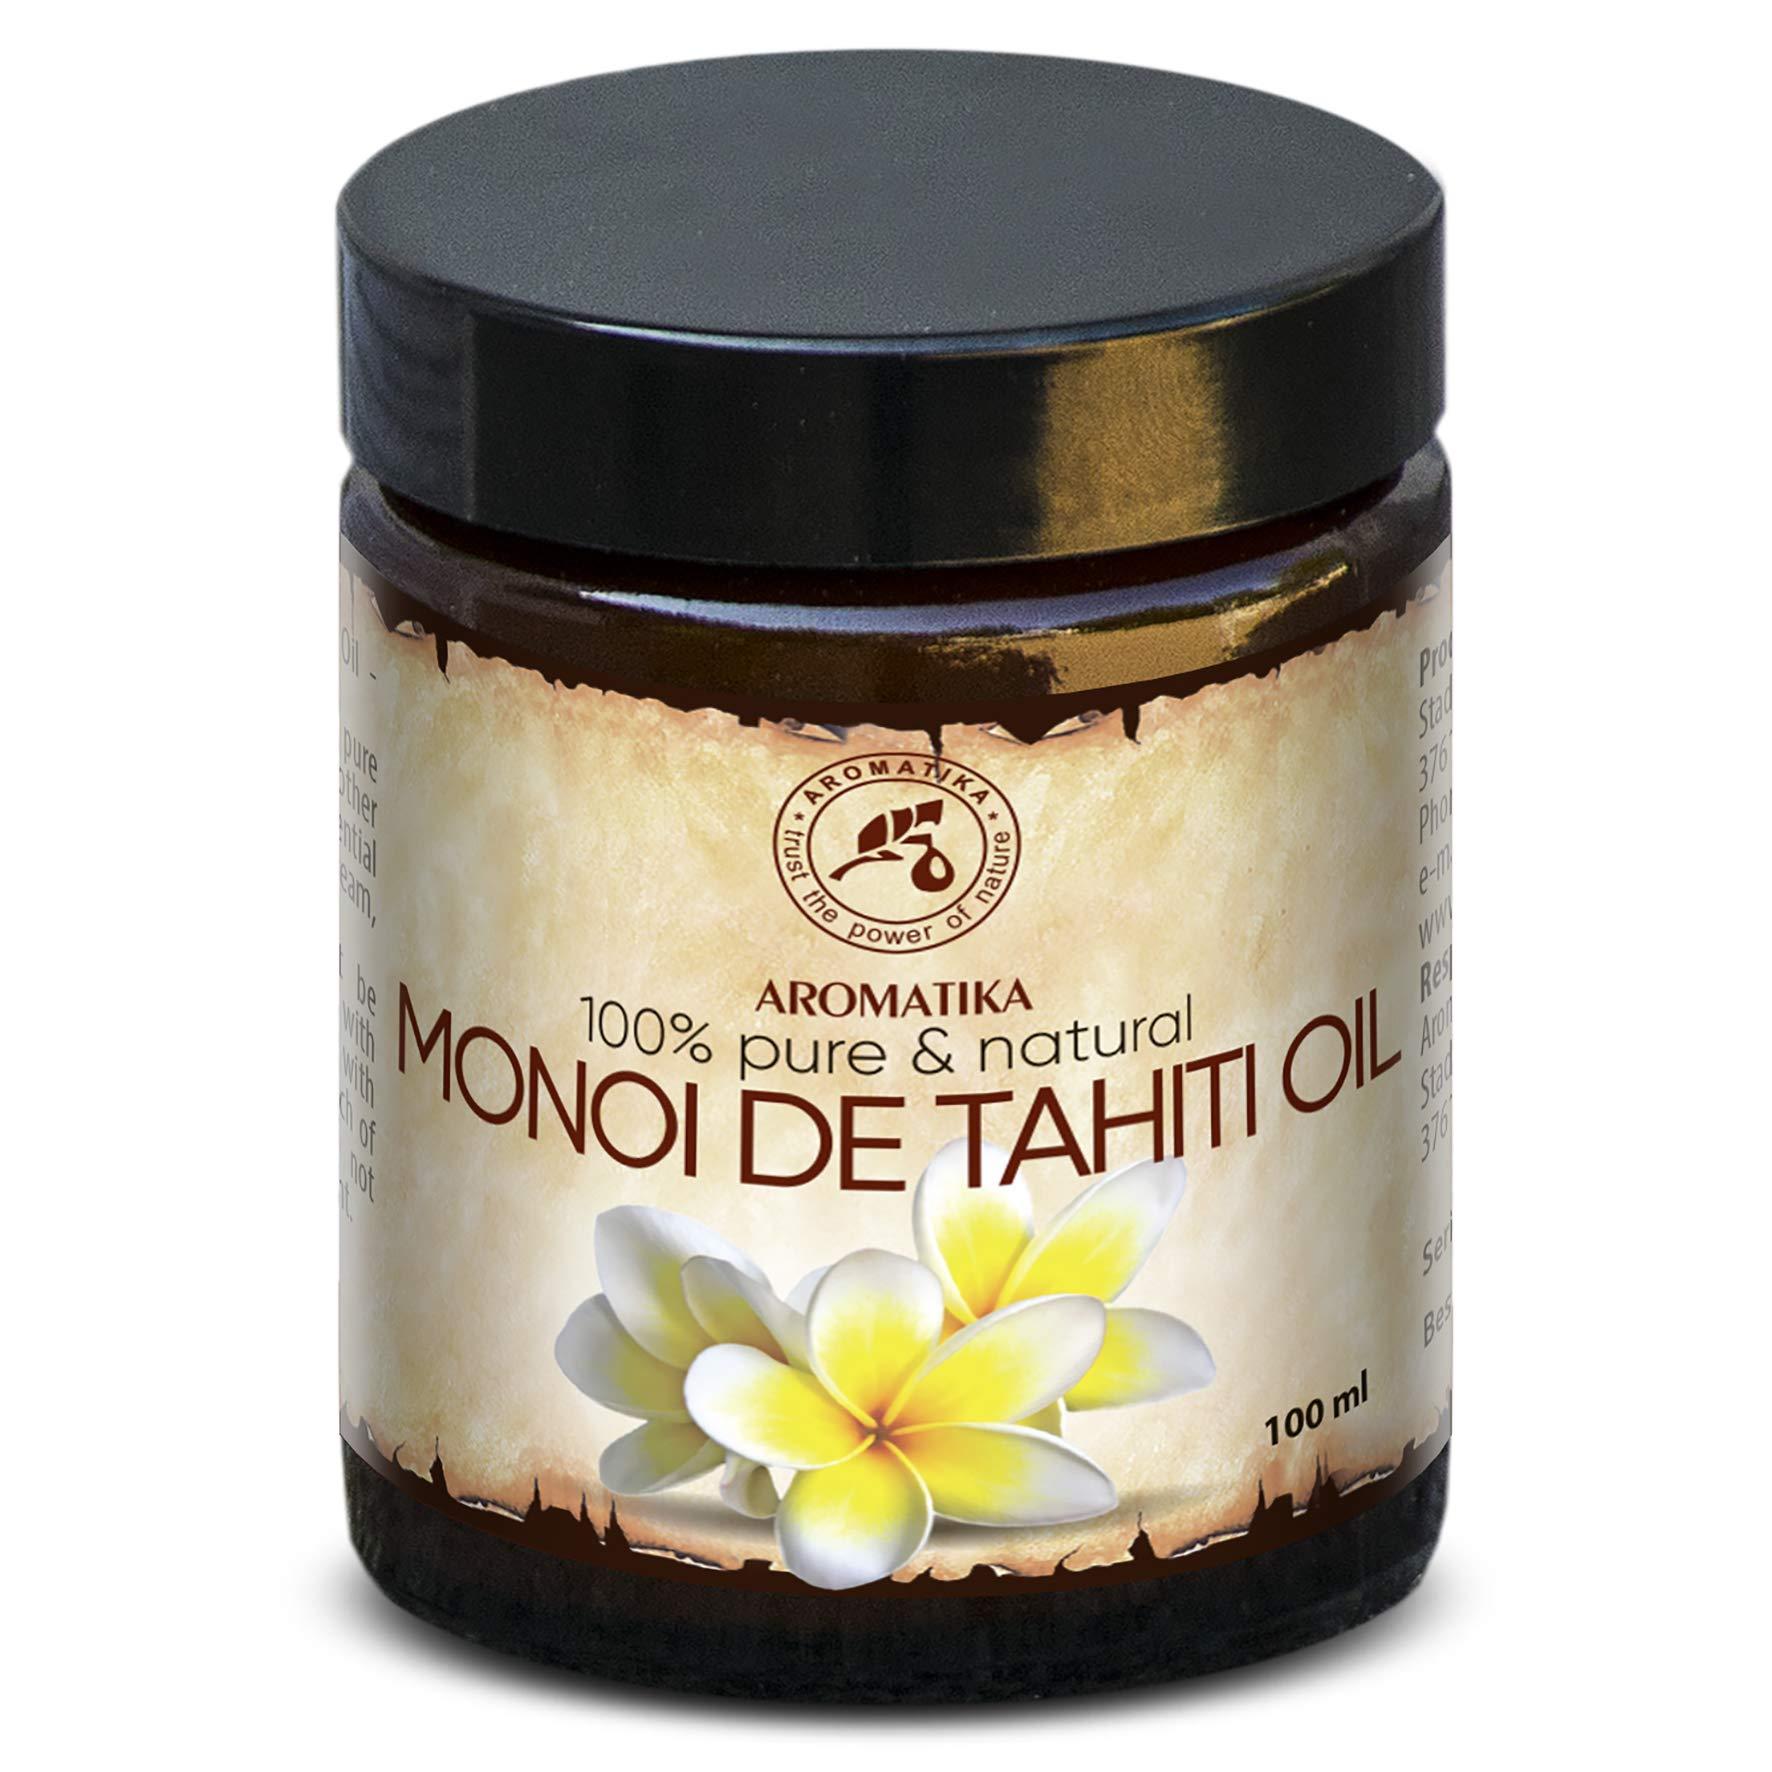 Tahitian Monoi Oil 100ml France Coco Buy Online In Suriname At Desertcart